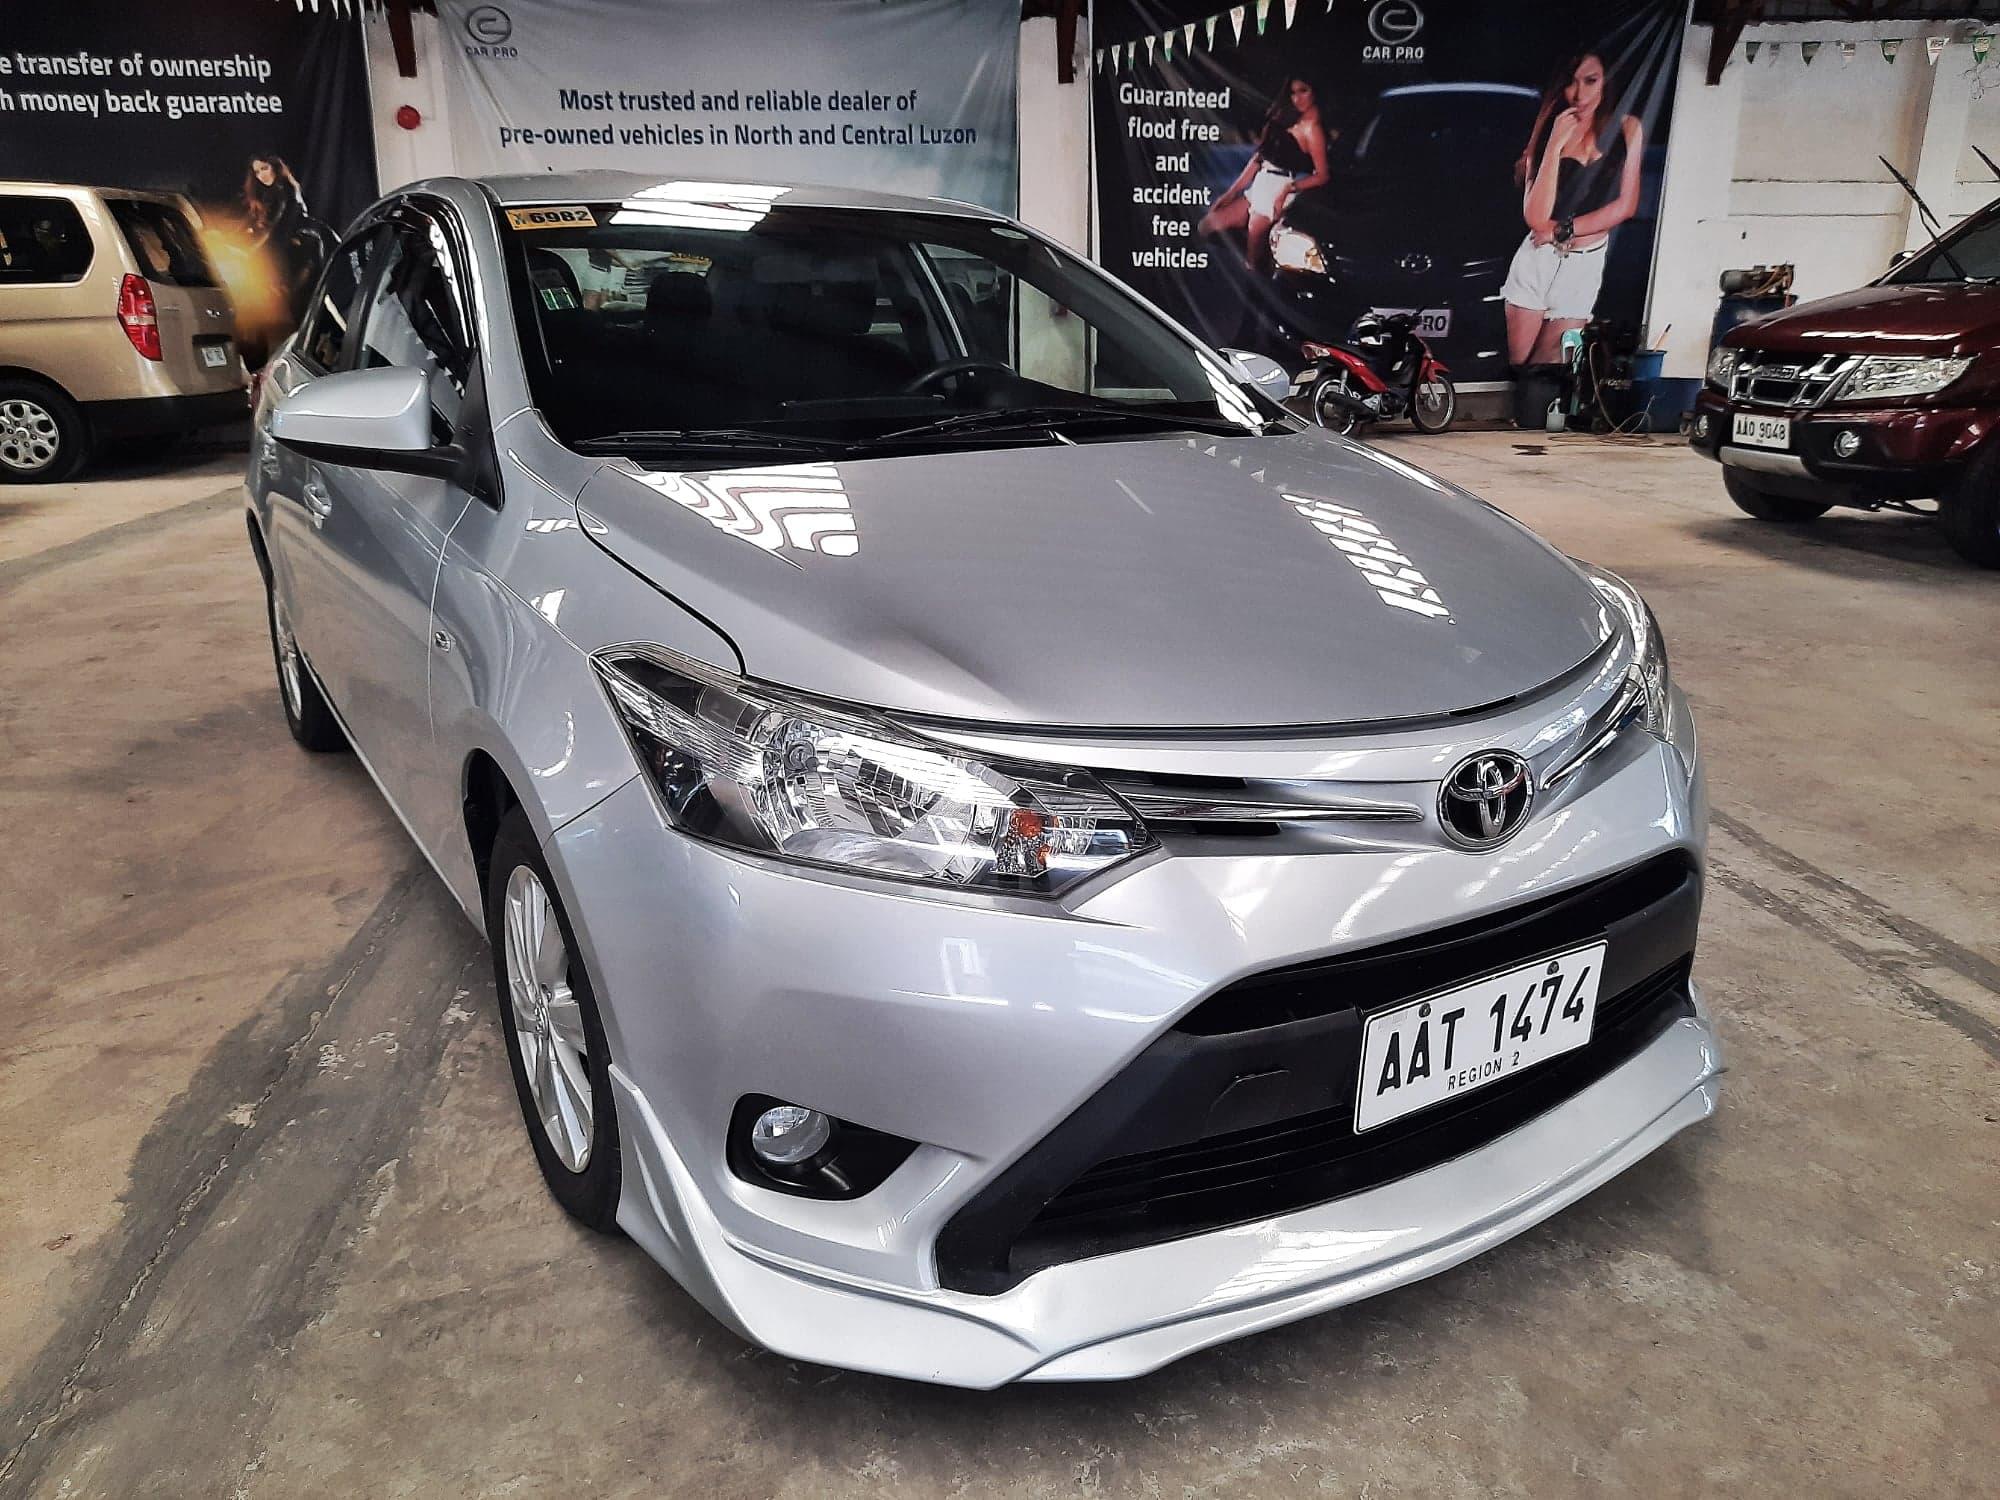 Kelebihan Kekurangan Toyota Vios 2015 Tangguh